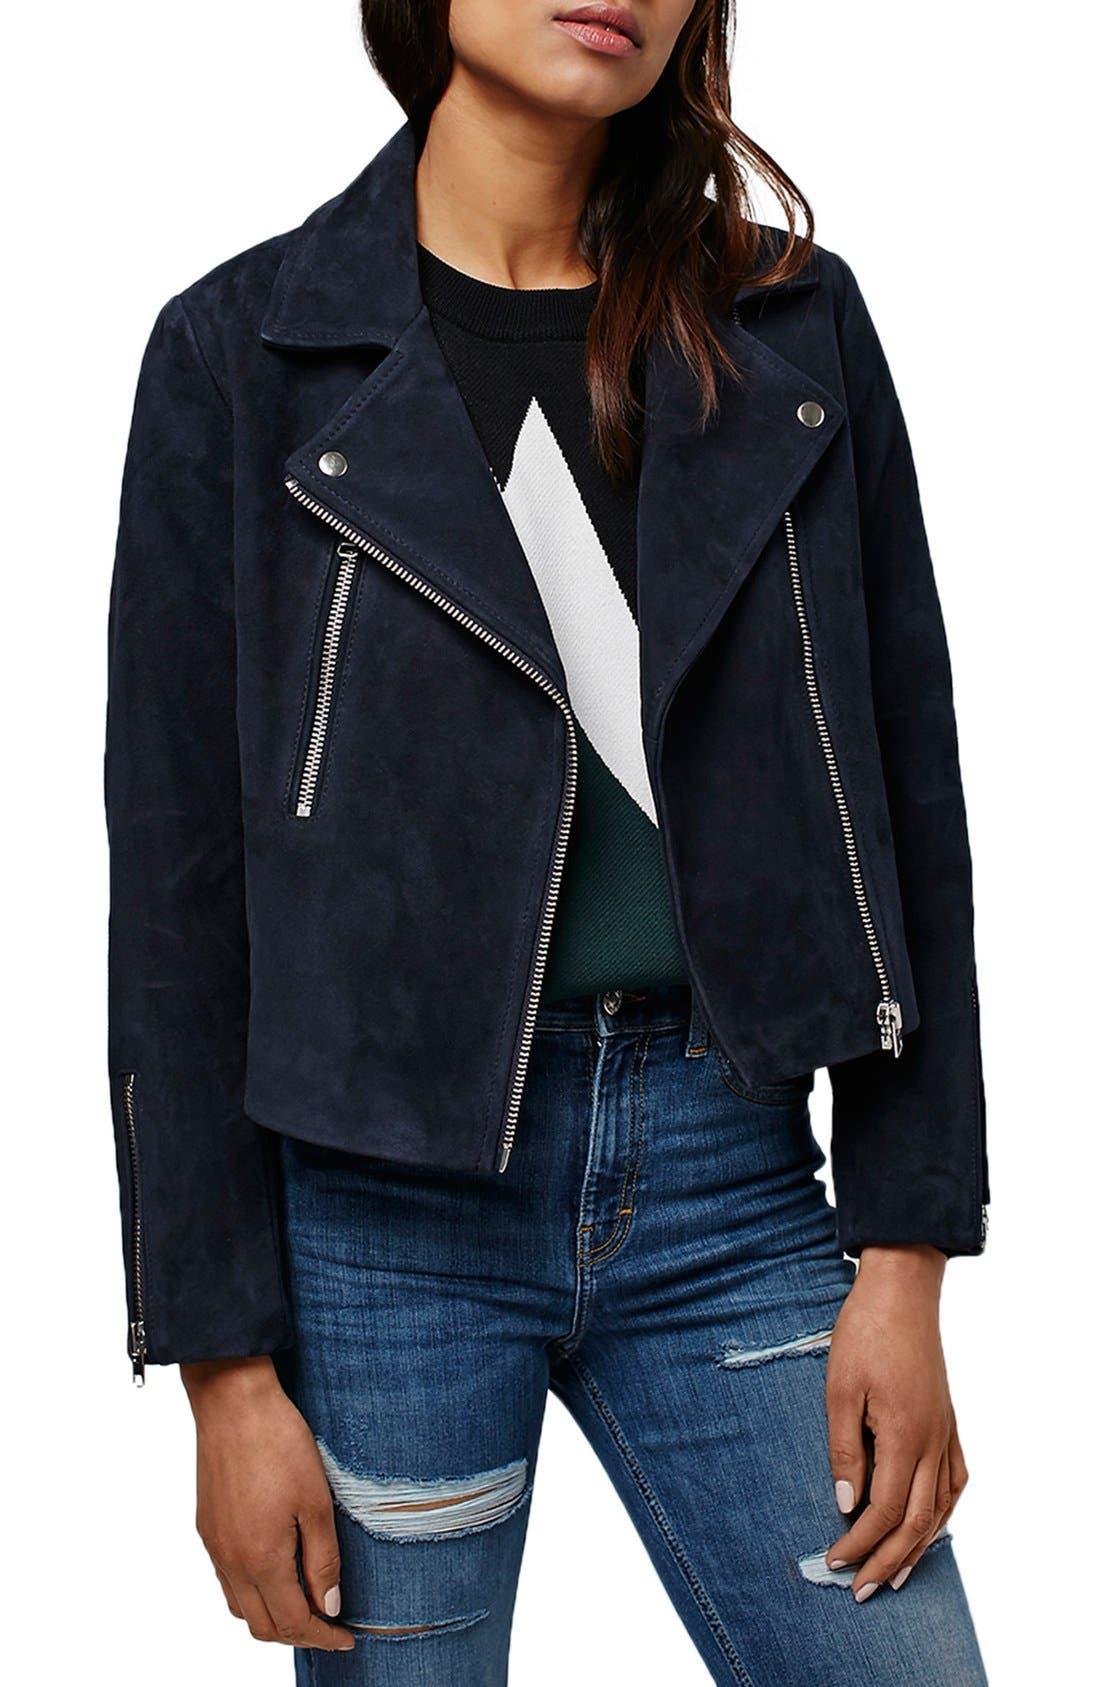 Alternate Image 1 Selected - Topshop 'Julie' Suede Moto Jacket